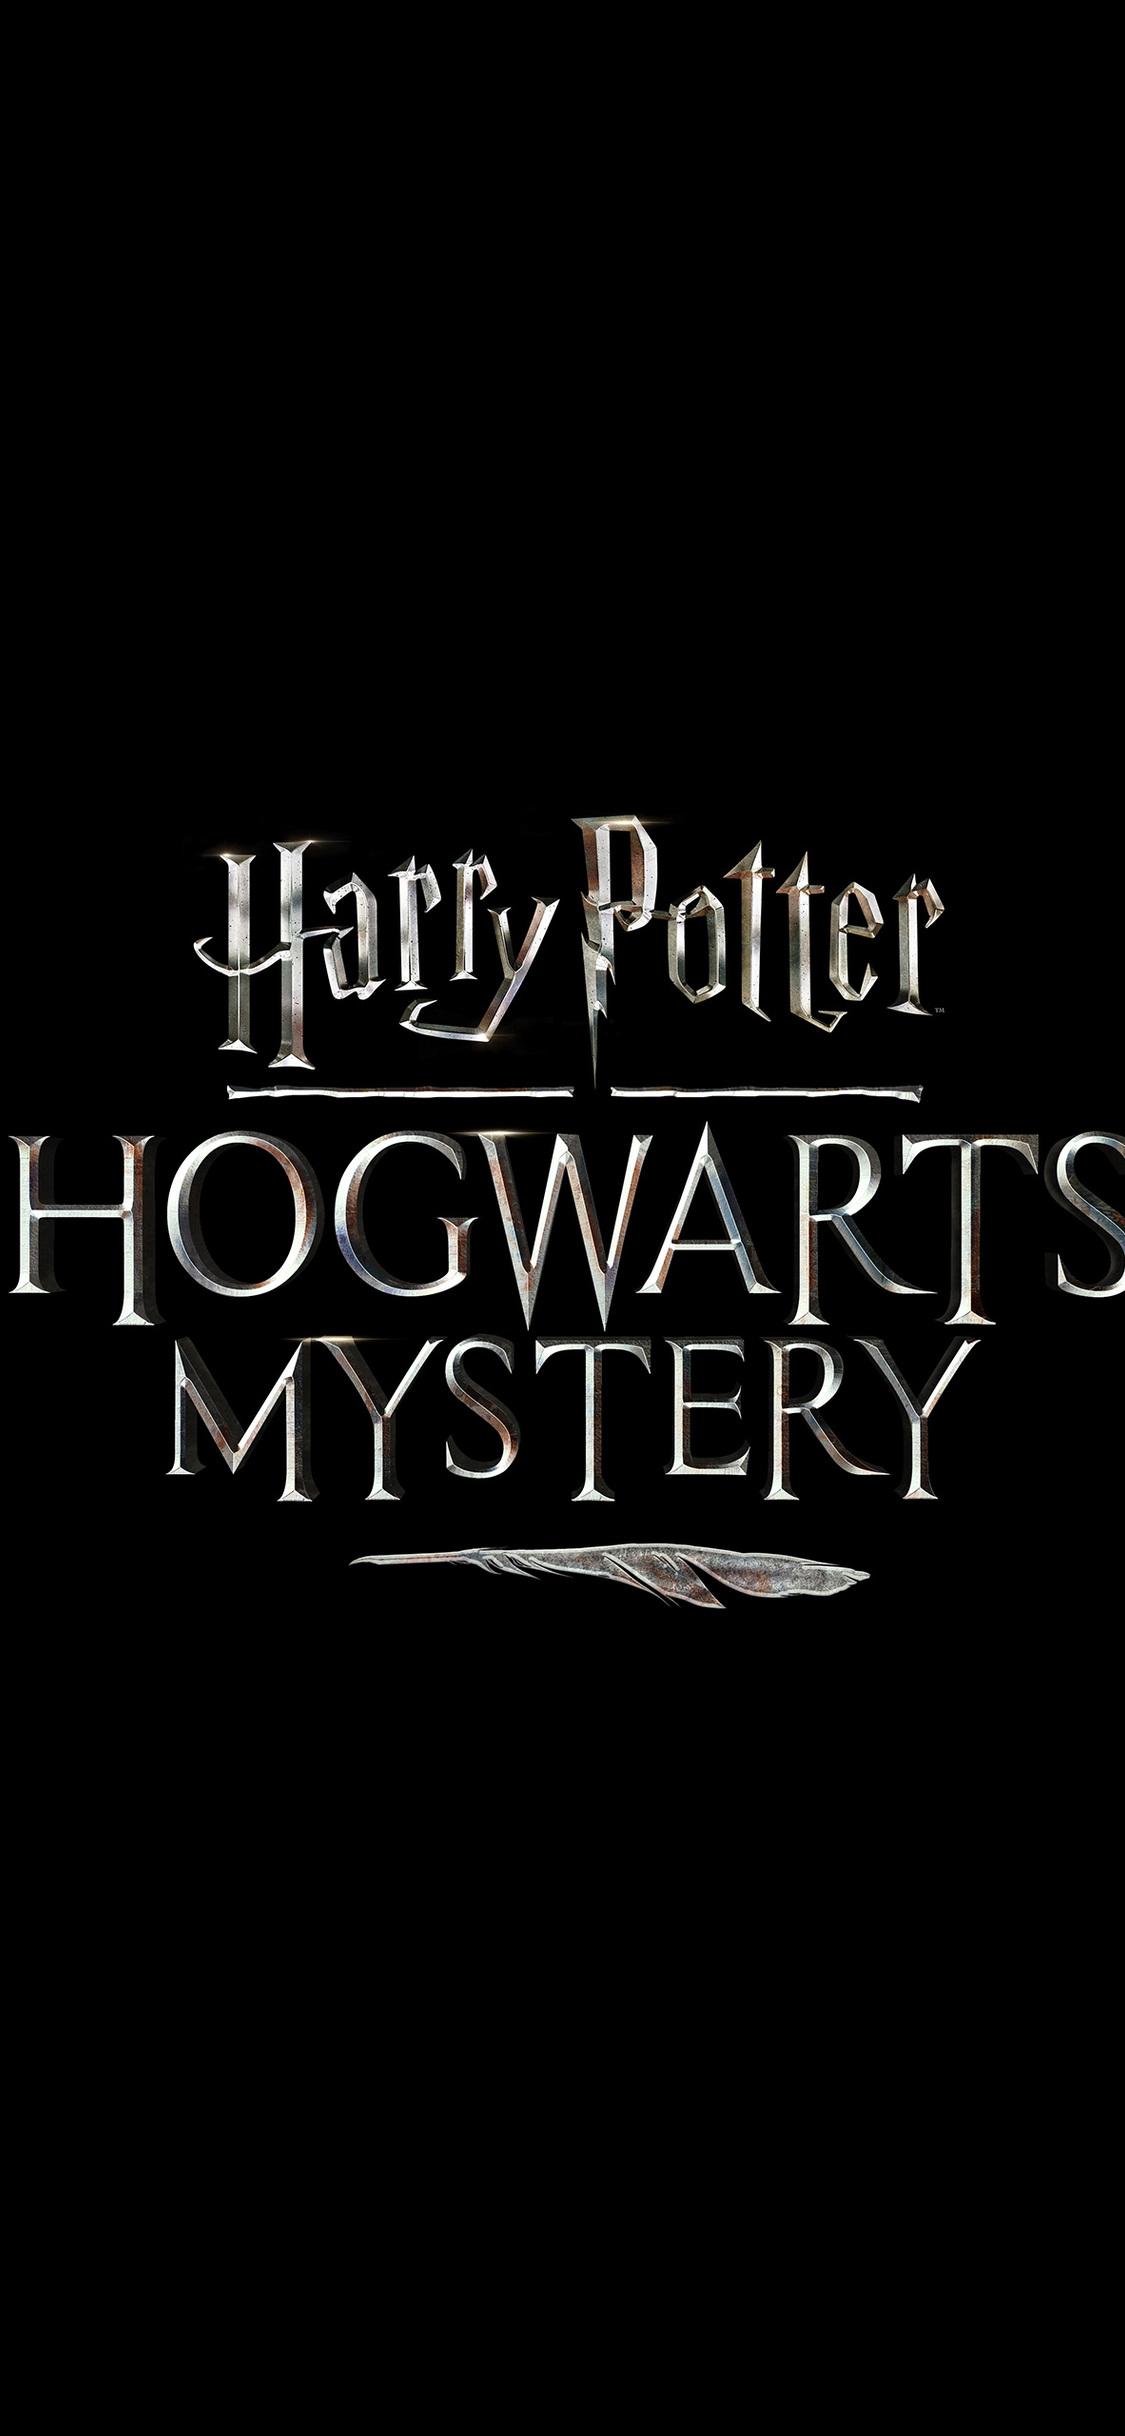 1125x2436 Harry Potter Hogwarts Mystery Game Logo Iphone Xs